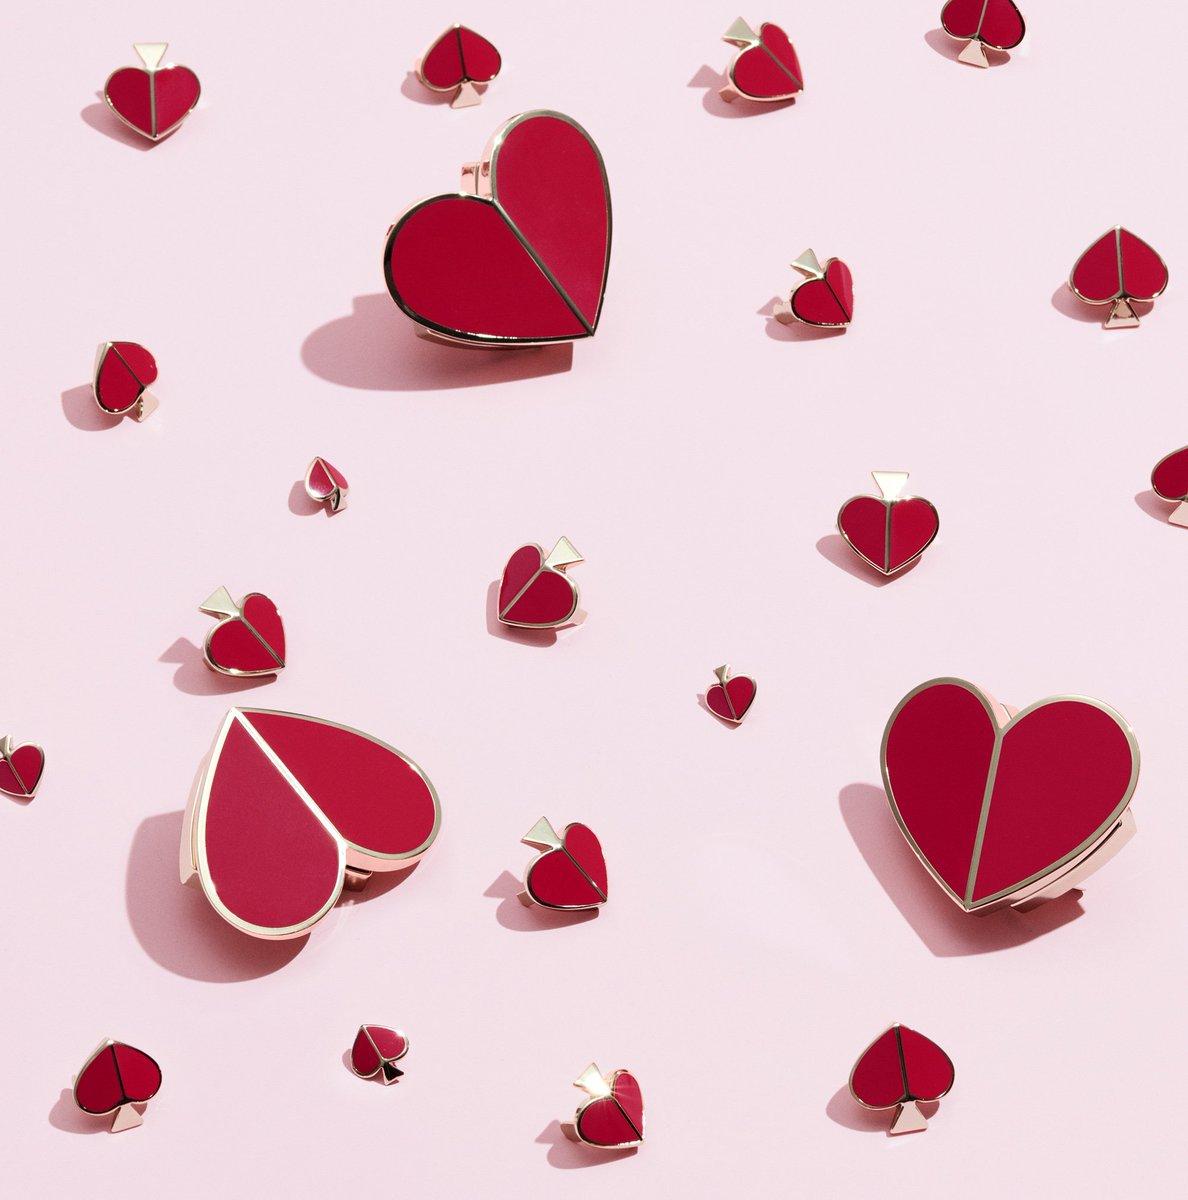 happy valentine's day!  ハートがたっぷりのバレンタインギフトガイドをチェックして。 https://t.co/7J21H4rk5E https://t.co/QBhWYHze0Z